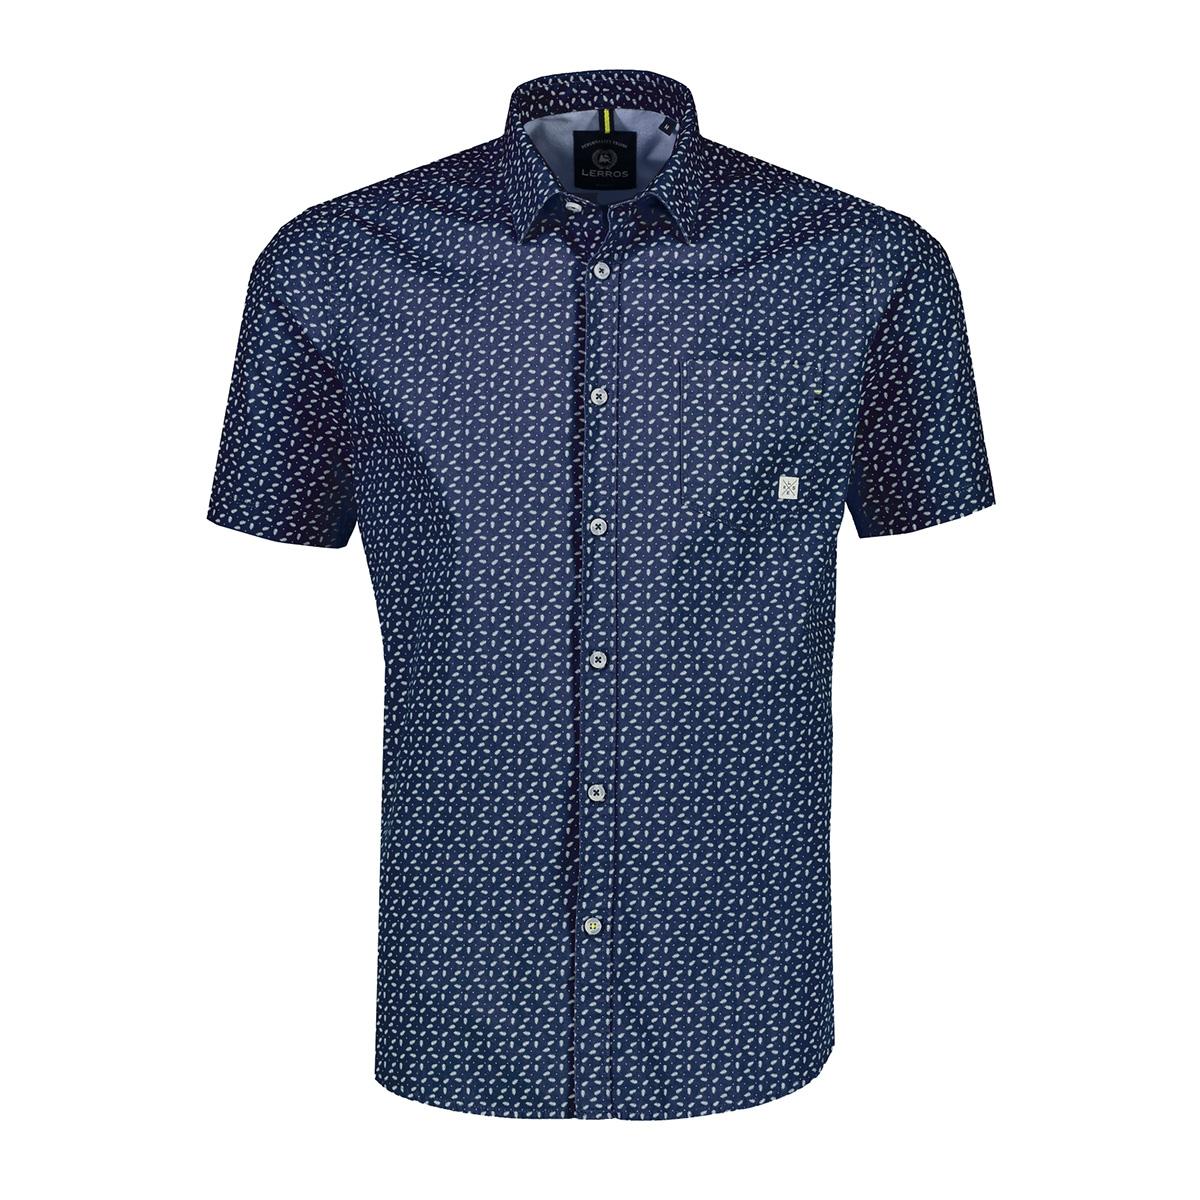 overhemd met all over print 2022035 lerros overhemd 474